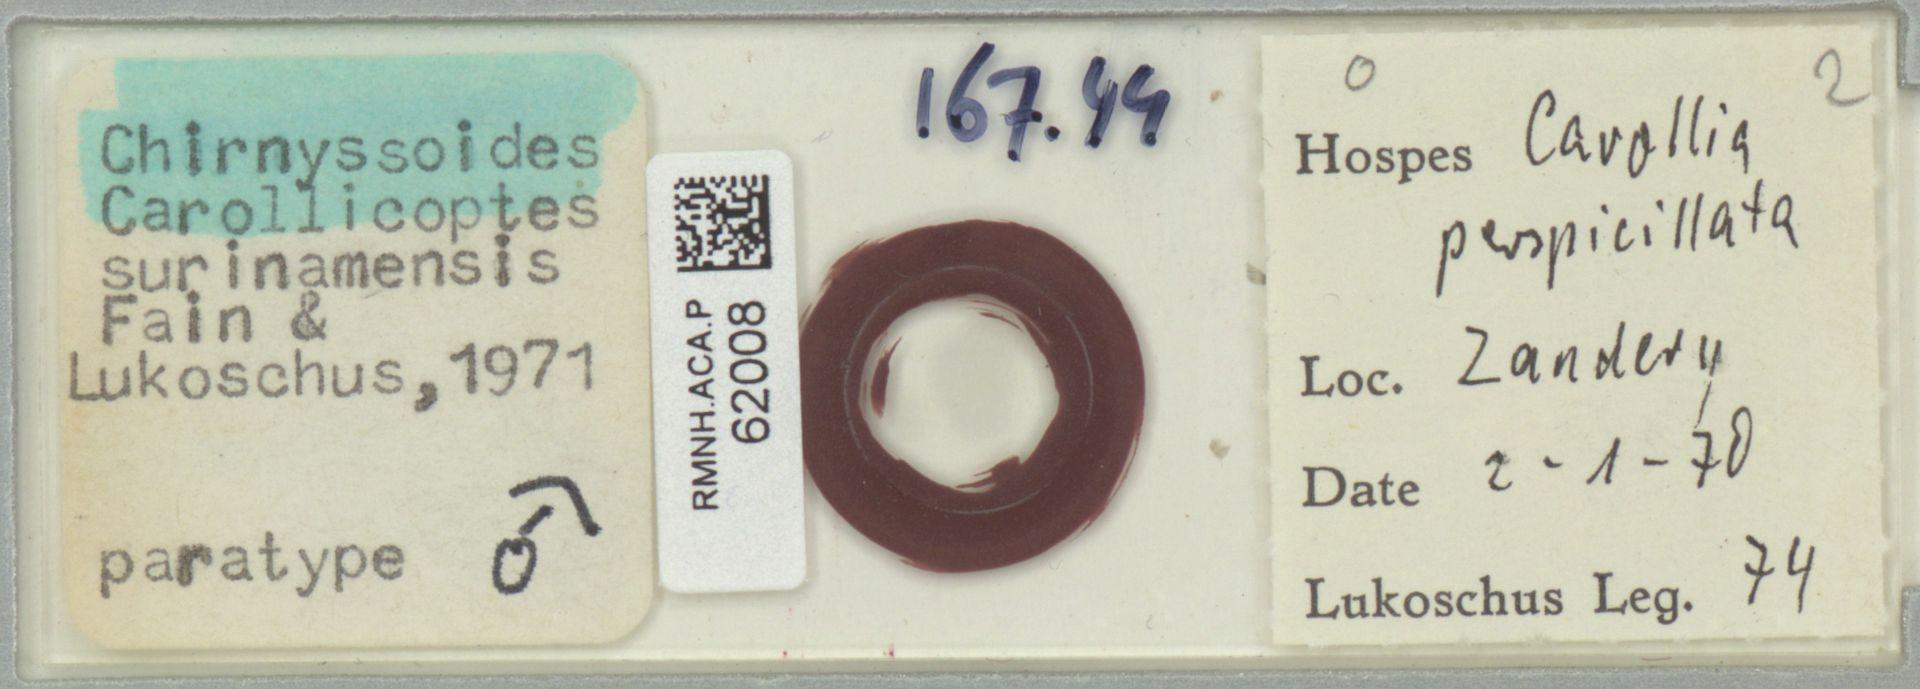 RMNH.ACA.P.62008 | Chirnyssoides (Carrolicoptes) surinamensis Fain & Lukoschus, 1971